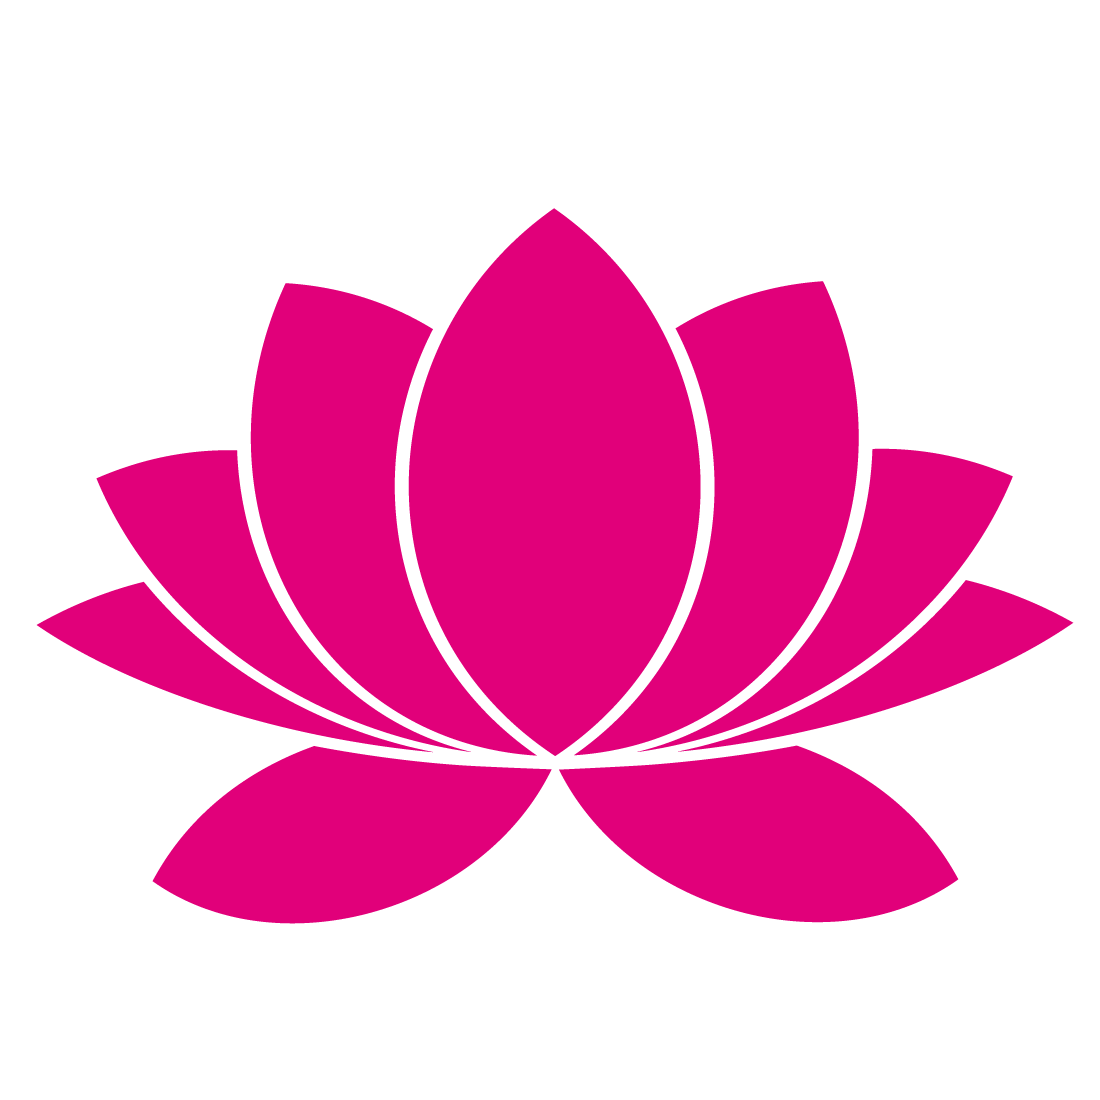 Lotus Flower Fotollistat Portada Png 1100 1100 Sticker Sign Stained Glass Diy Lotus Logo